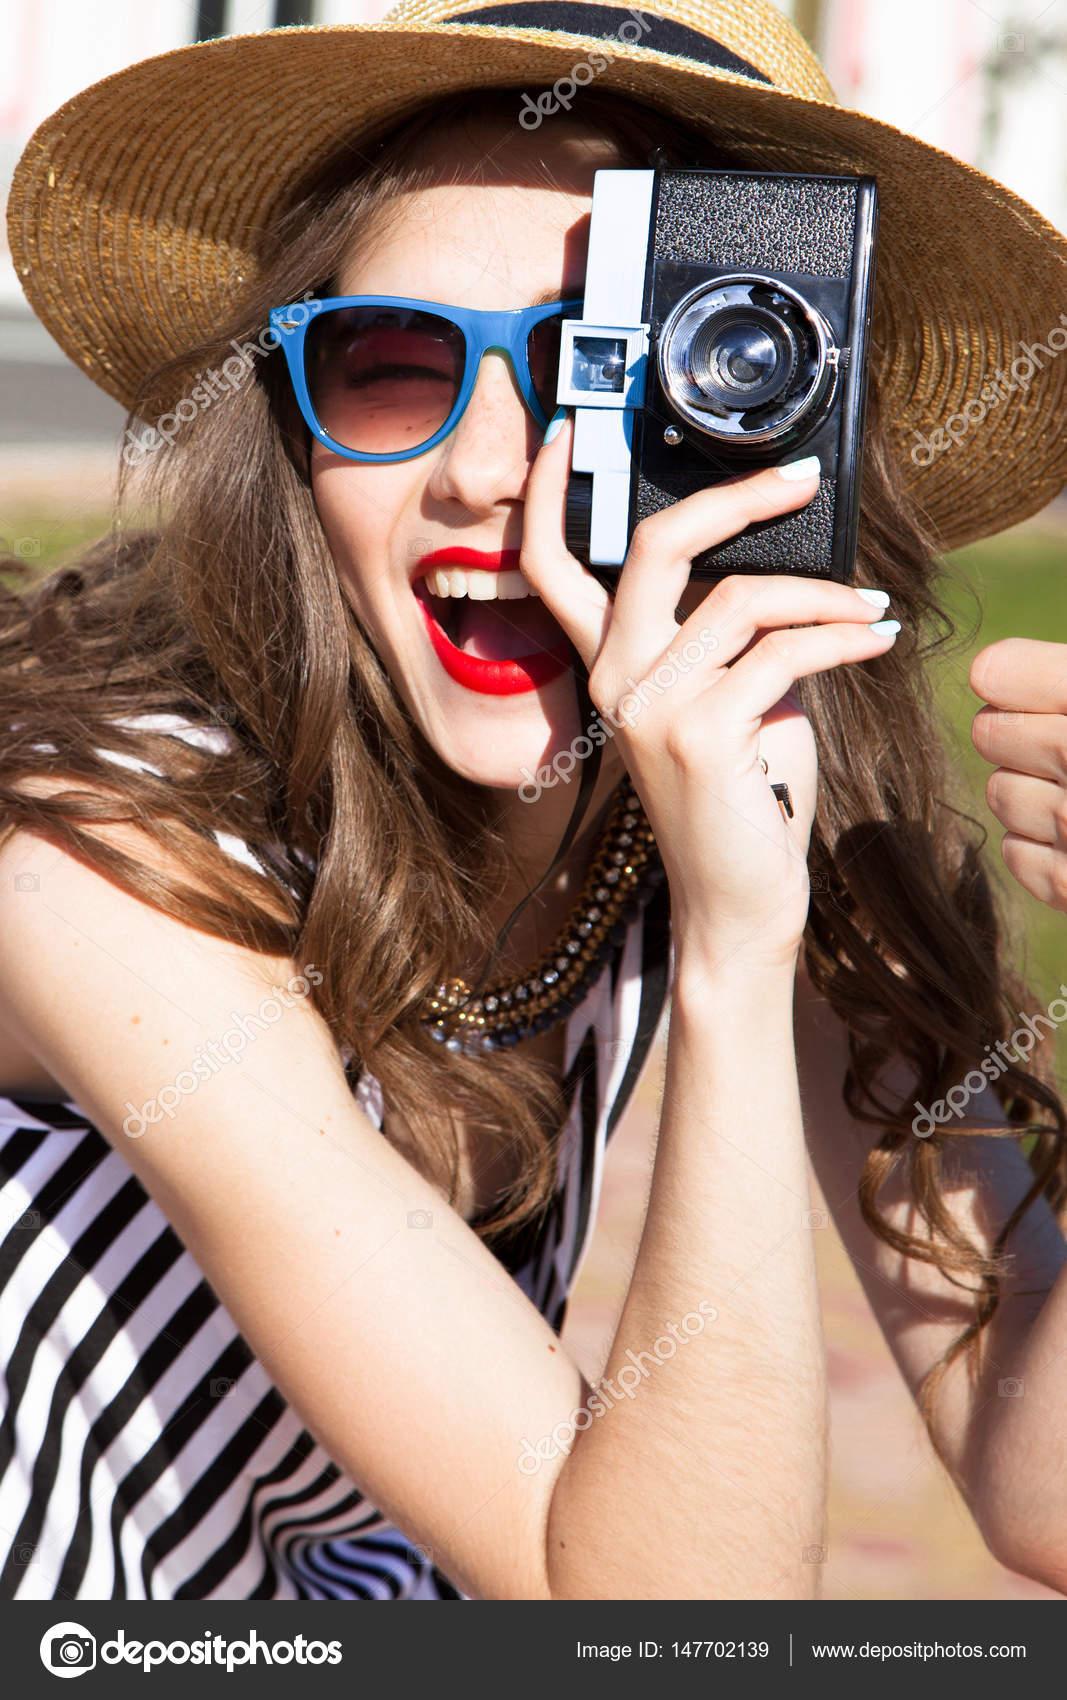 06a6eb309df7 Γελώντας πορτρέτο του μοντέρνο και κομψό ευτυχισμένη γυναίκα λήψη  φωτογραφίας με vintage φωτογραφική μηχανή στην ηλιόλουστη μέρα — Εικόνα από  ...